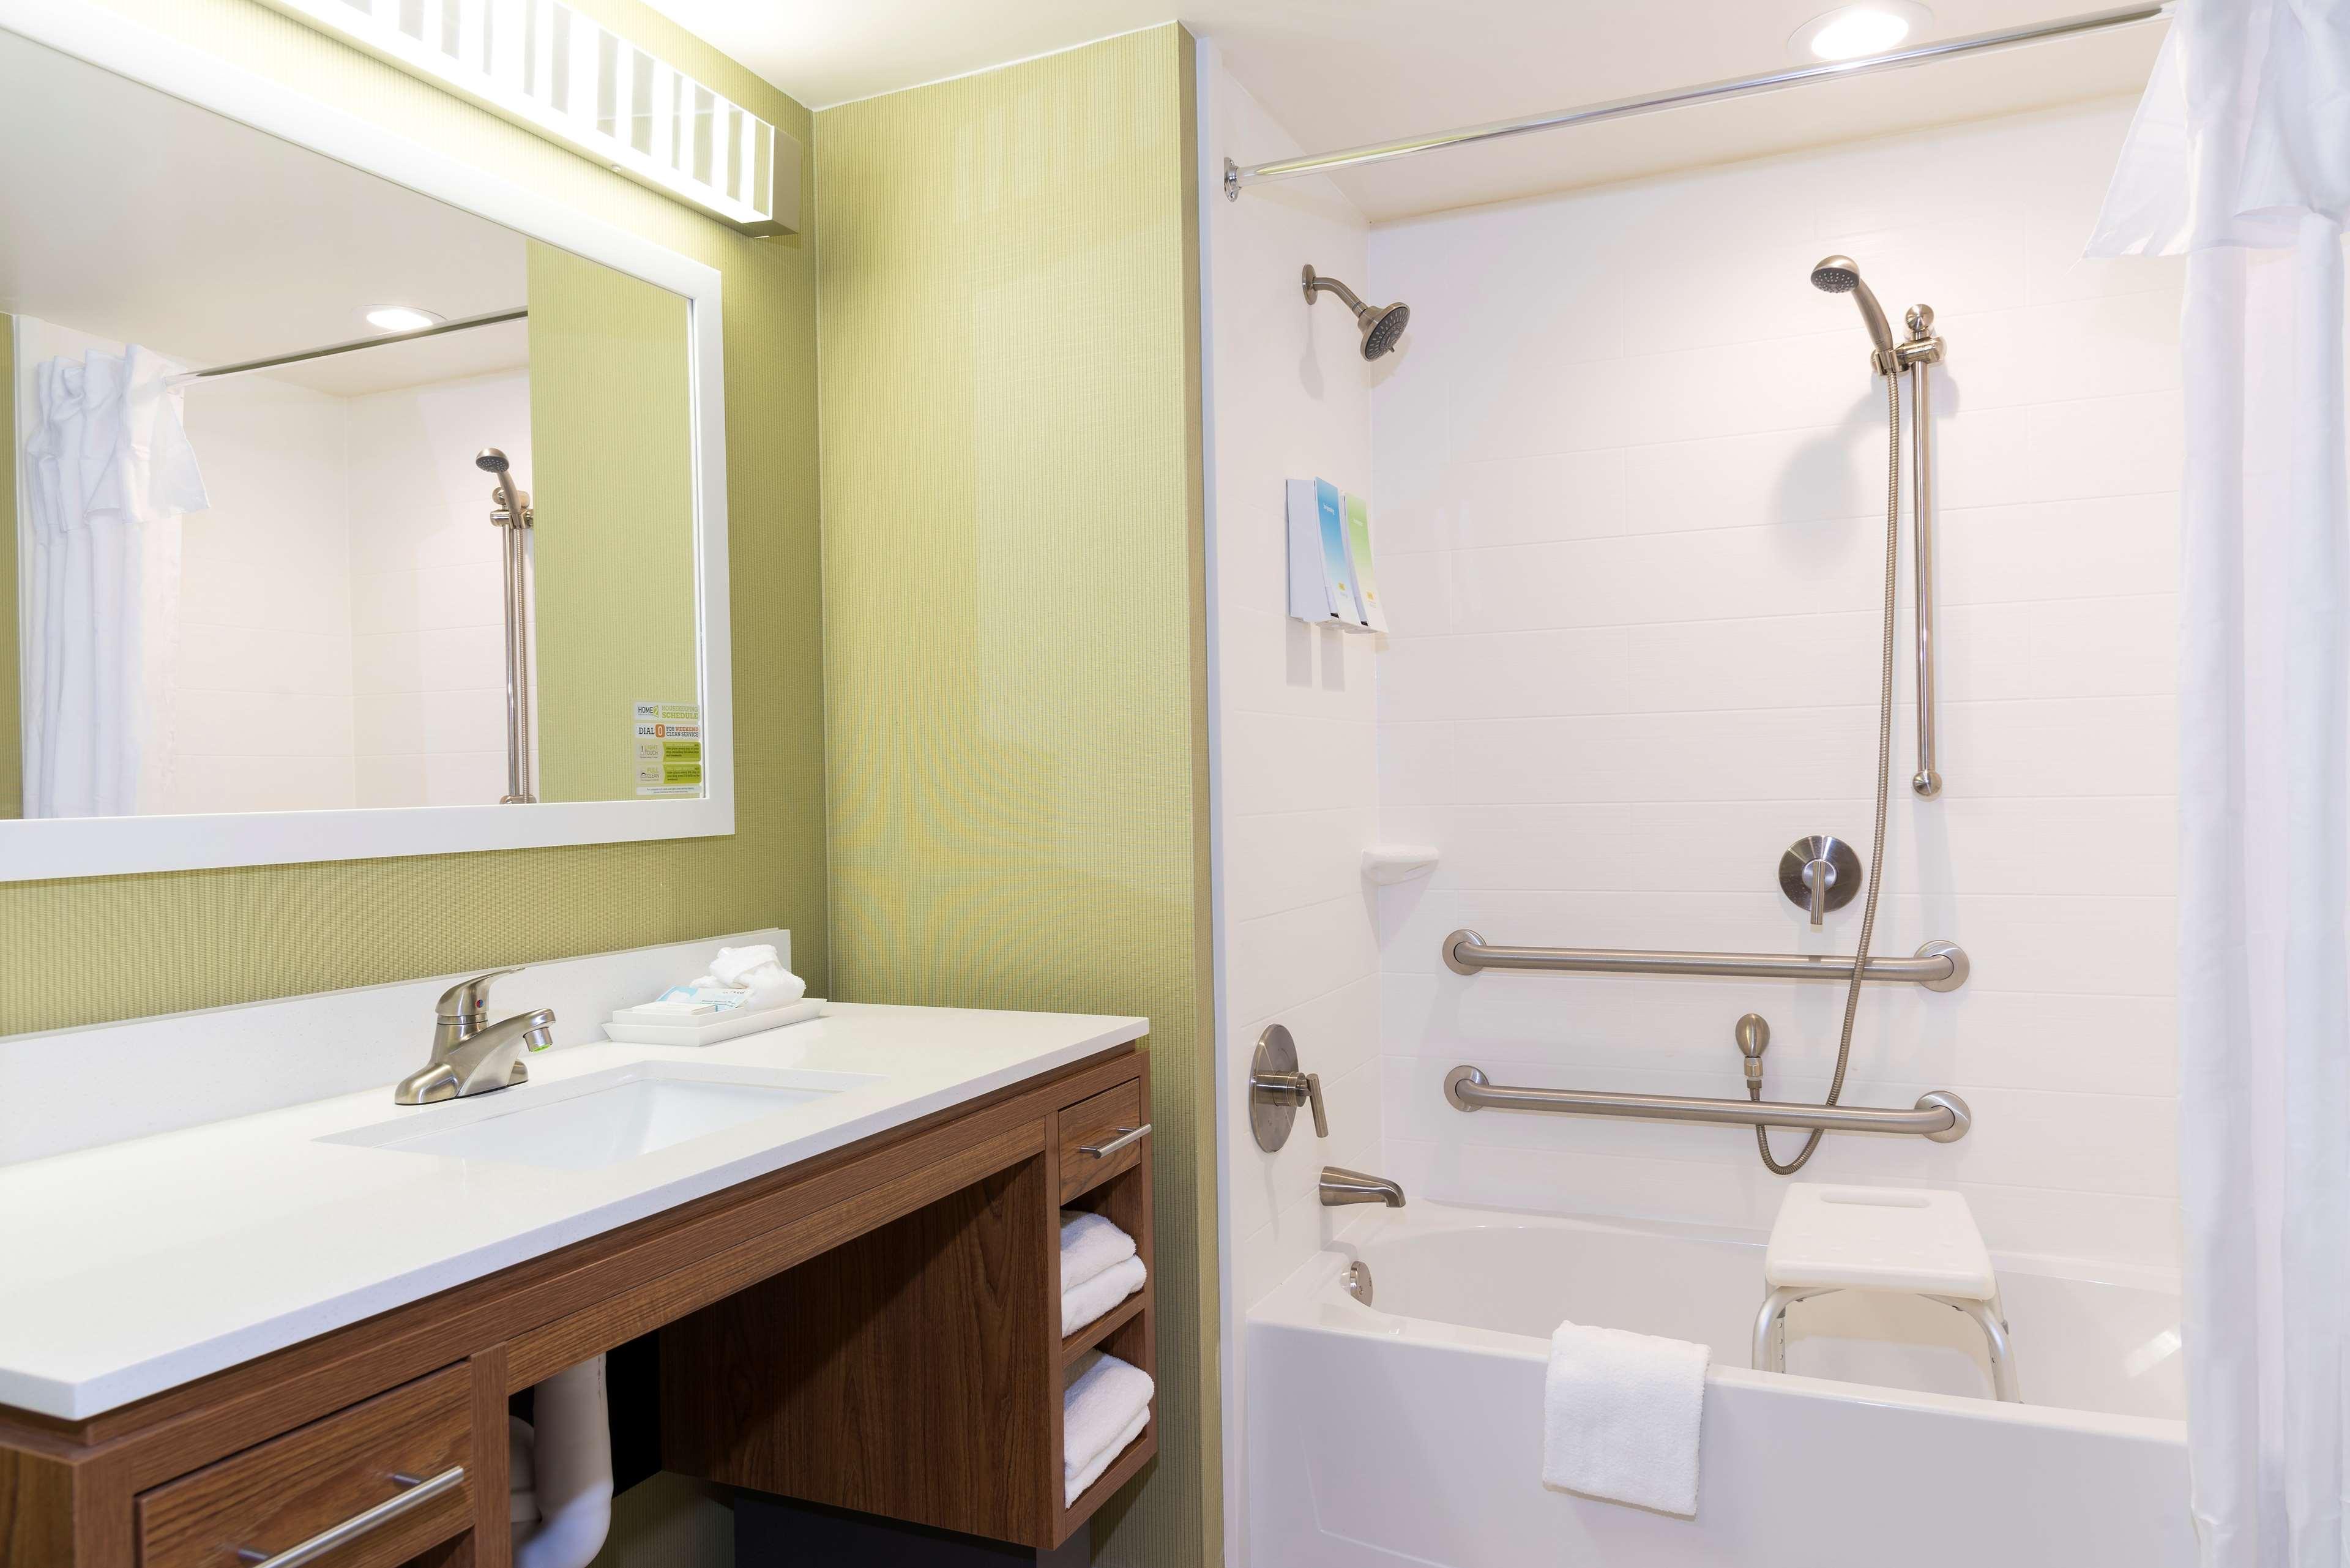 Home2 Suites by Hilton Nokomis Sarasota Casey Key image 15